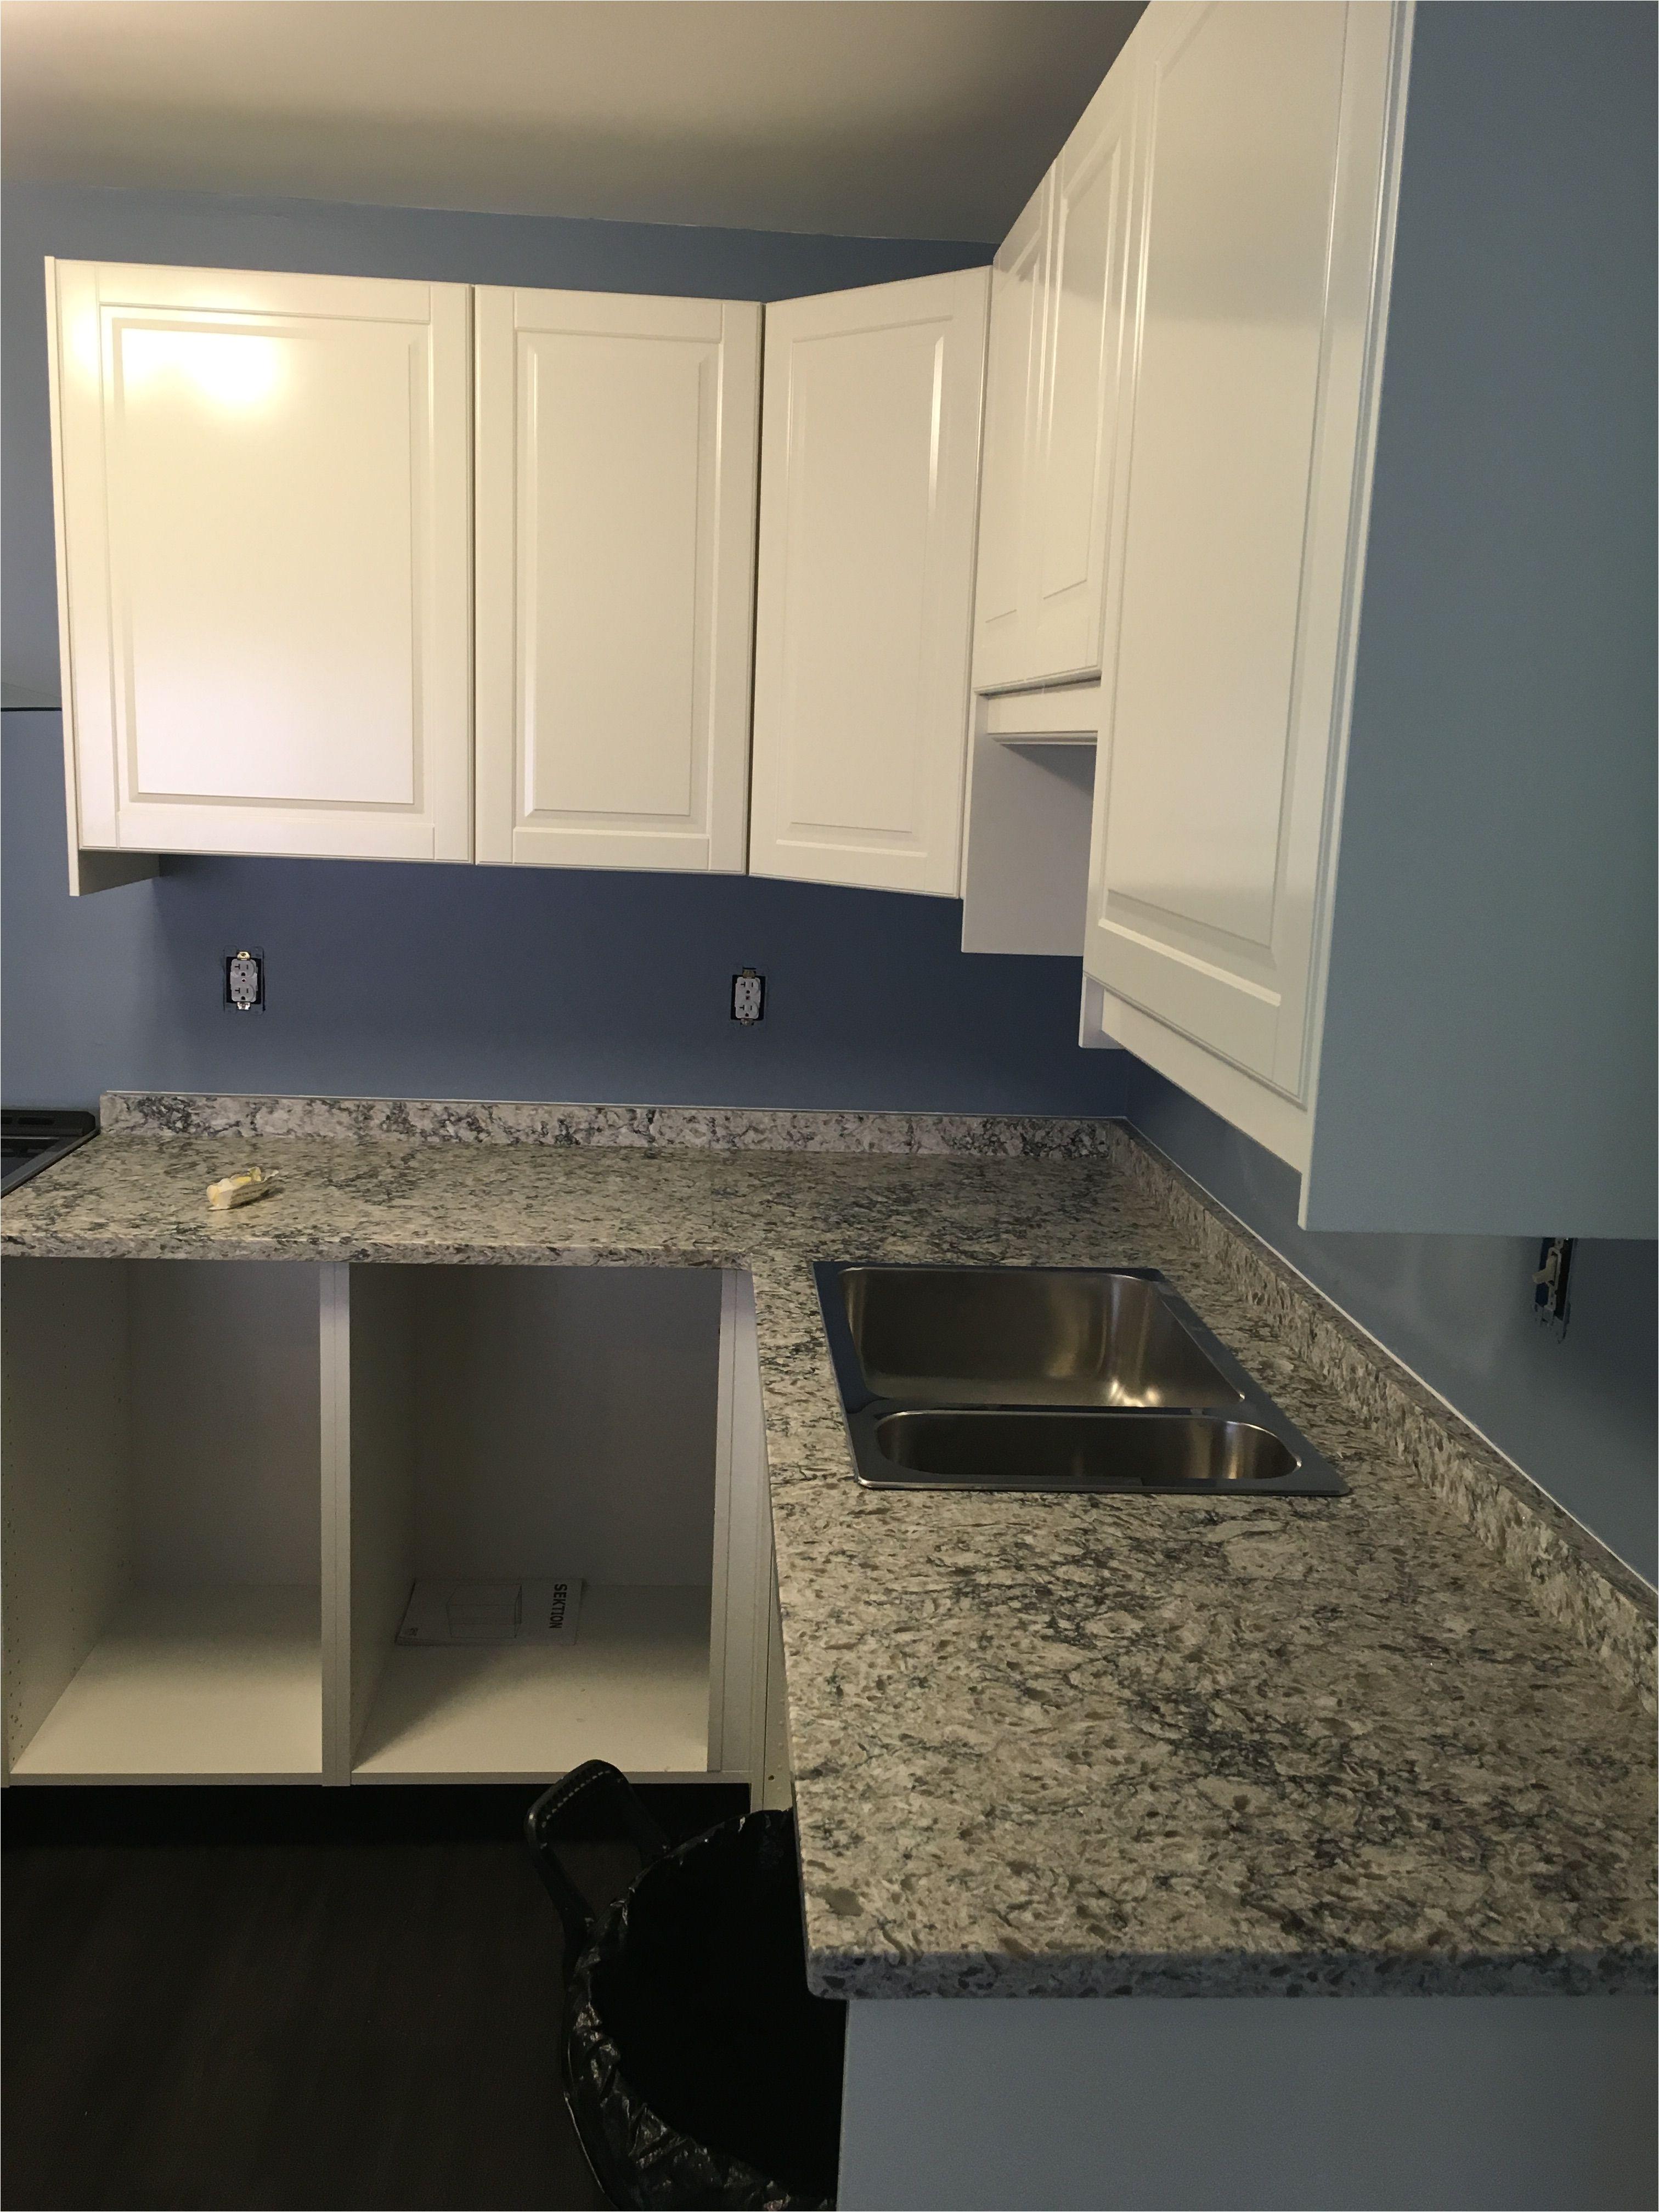 Fridge Stove Sink Combo Ikea Ikea Bodbyn Off White Cabinets with Himalayan Moon Quartz Kitchen